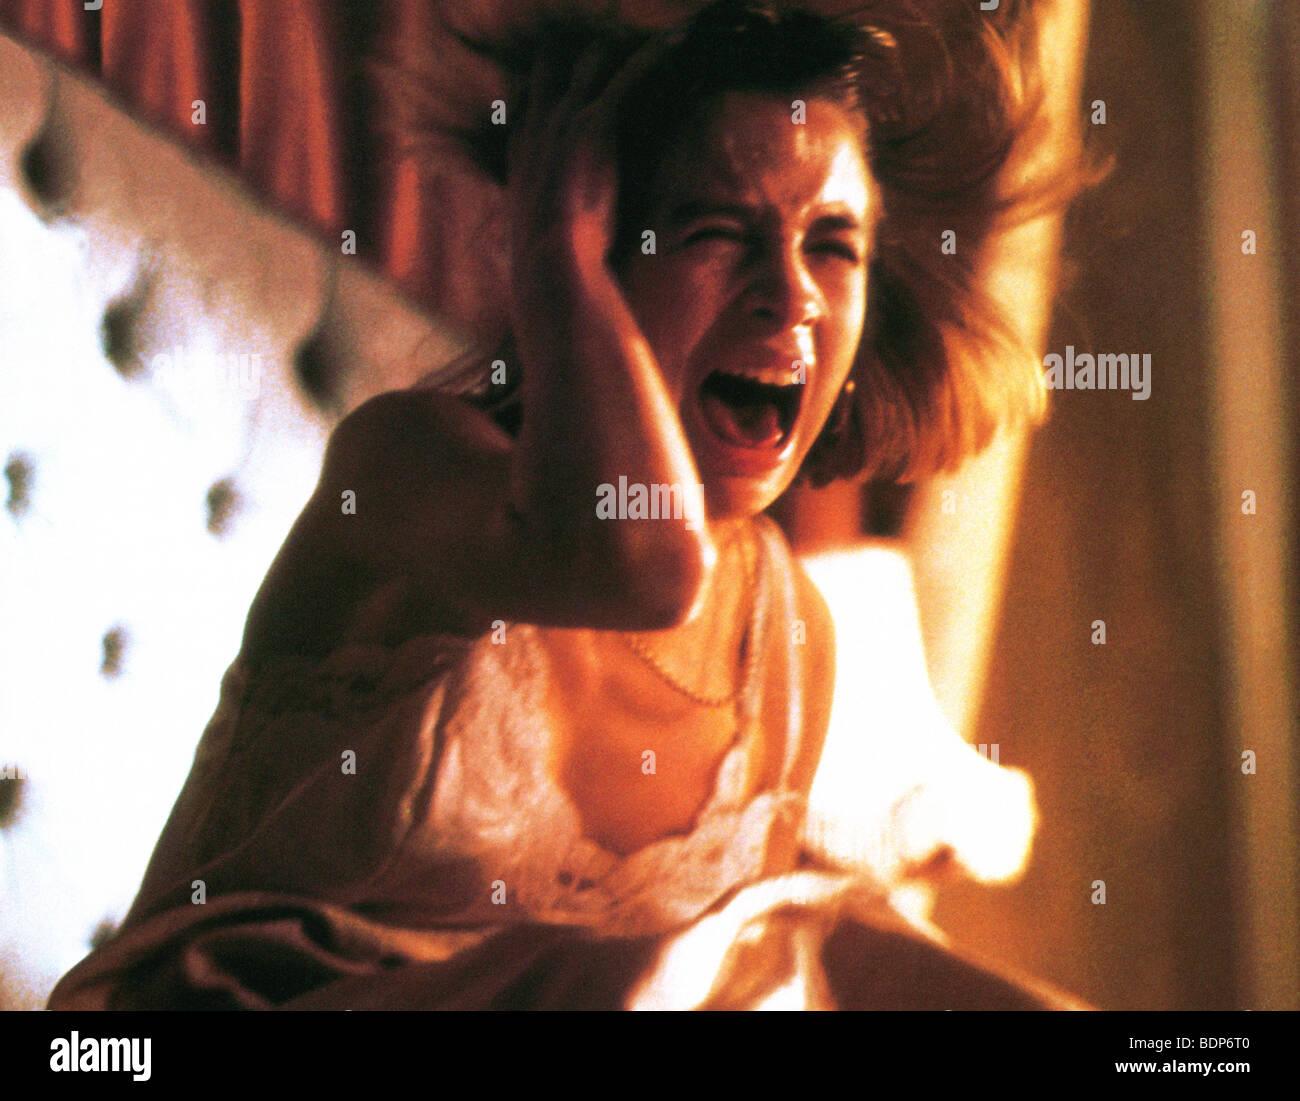 MONA LISA - 1986 HandMade/Palace film with Cathy Tyson - Stock Image